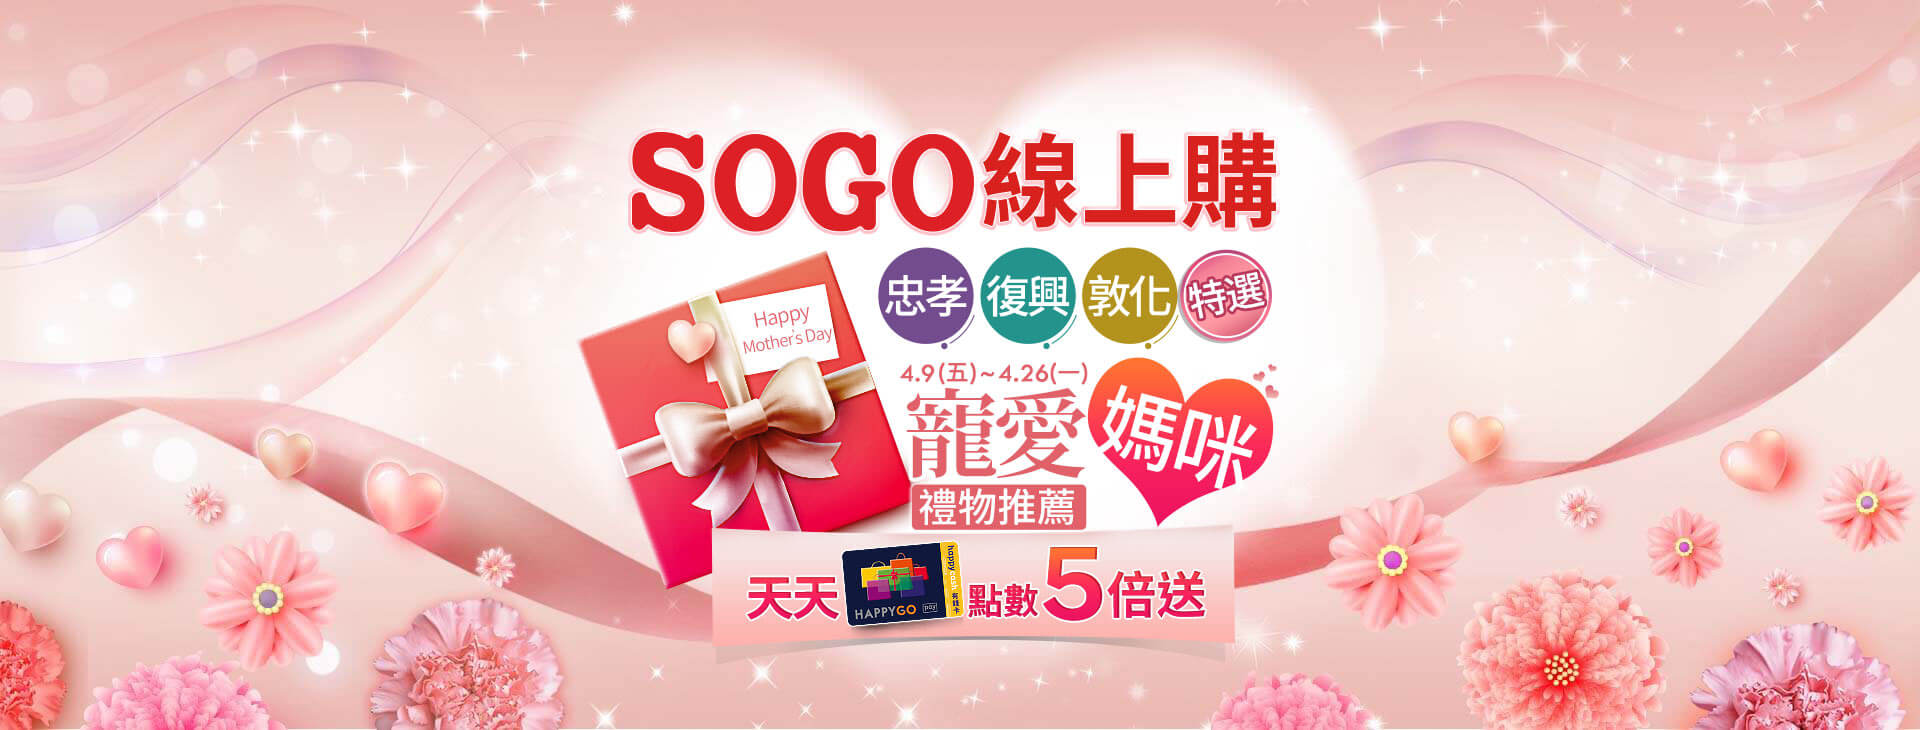 SOGO線上購「寵愛媽咪禮物推薦」